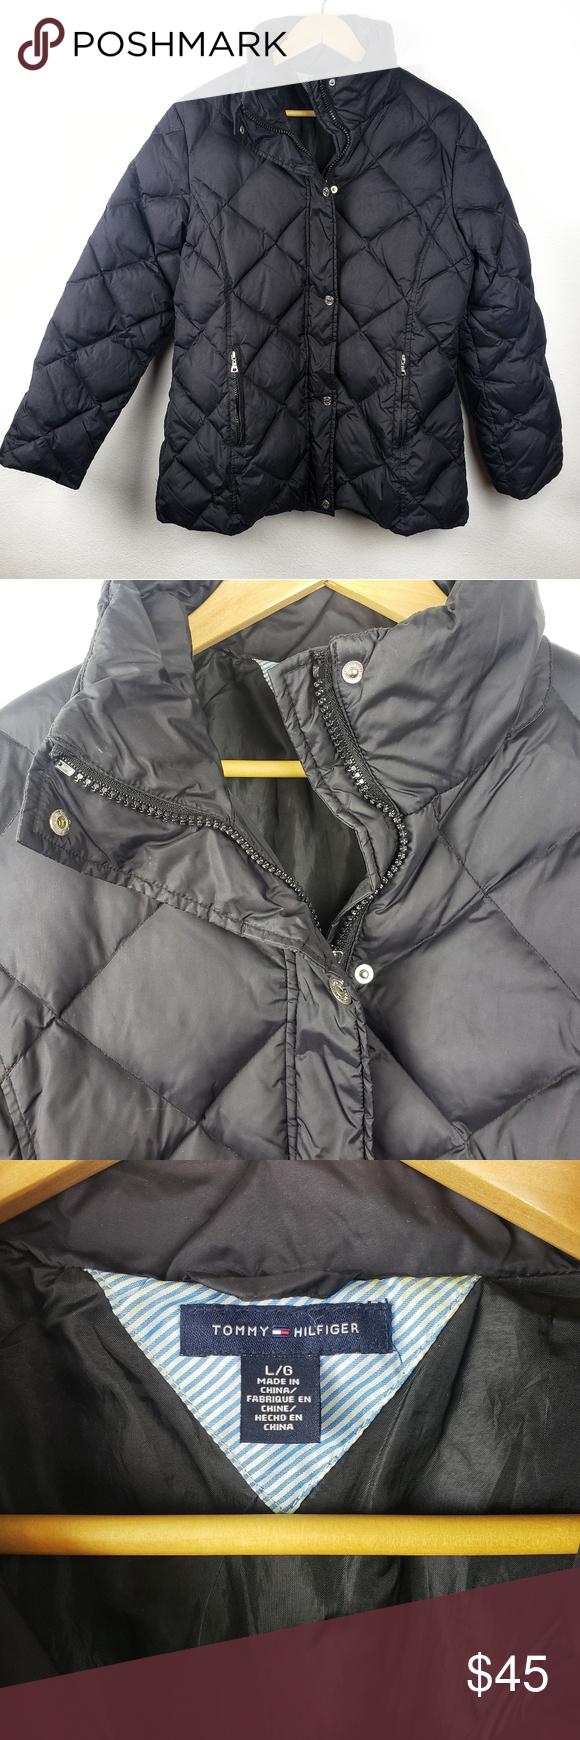 Tommy Hilfiger Black Full Zip Puffer Coat Large